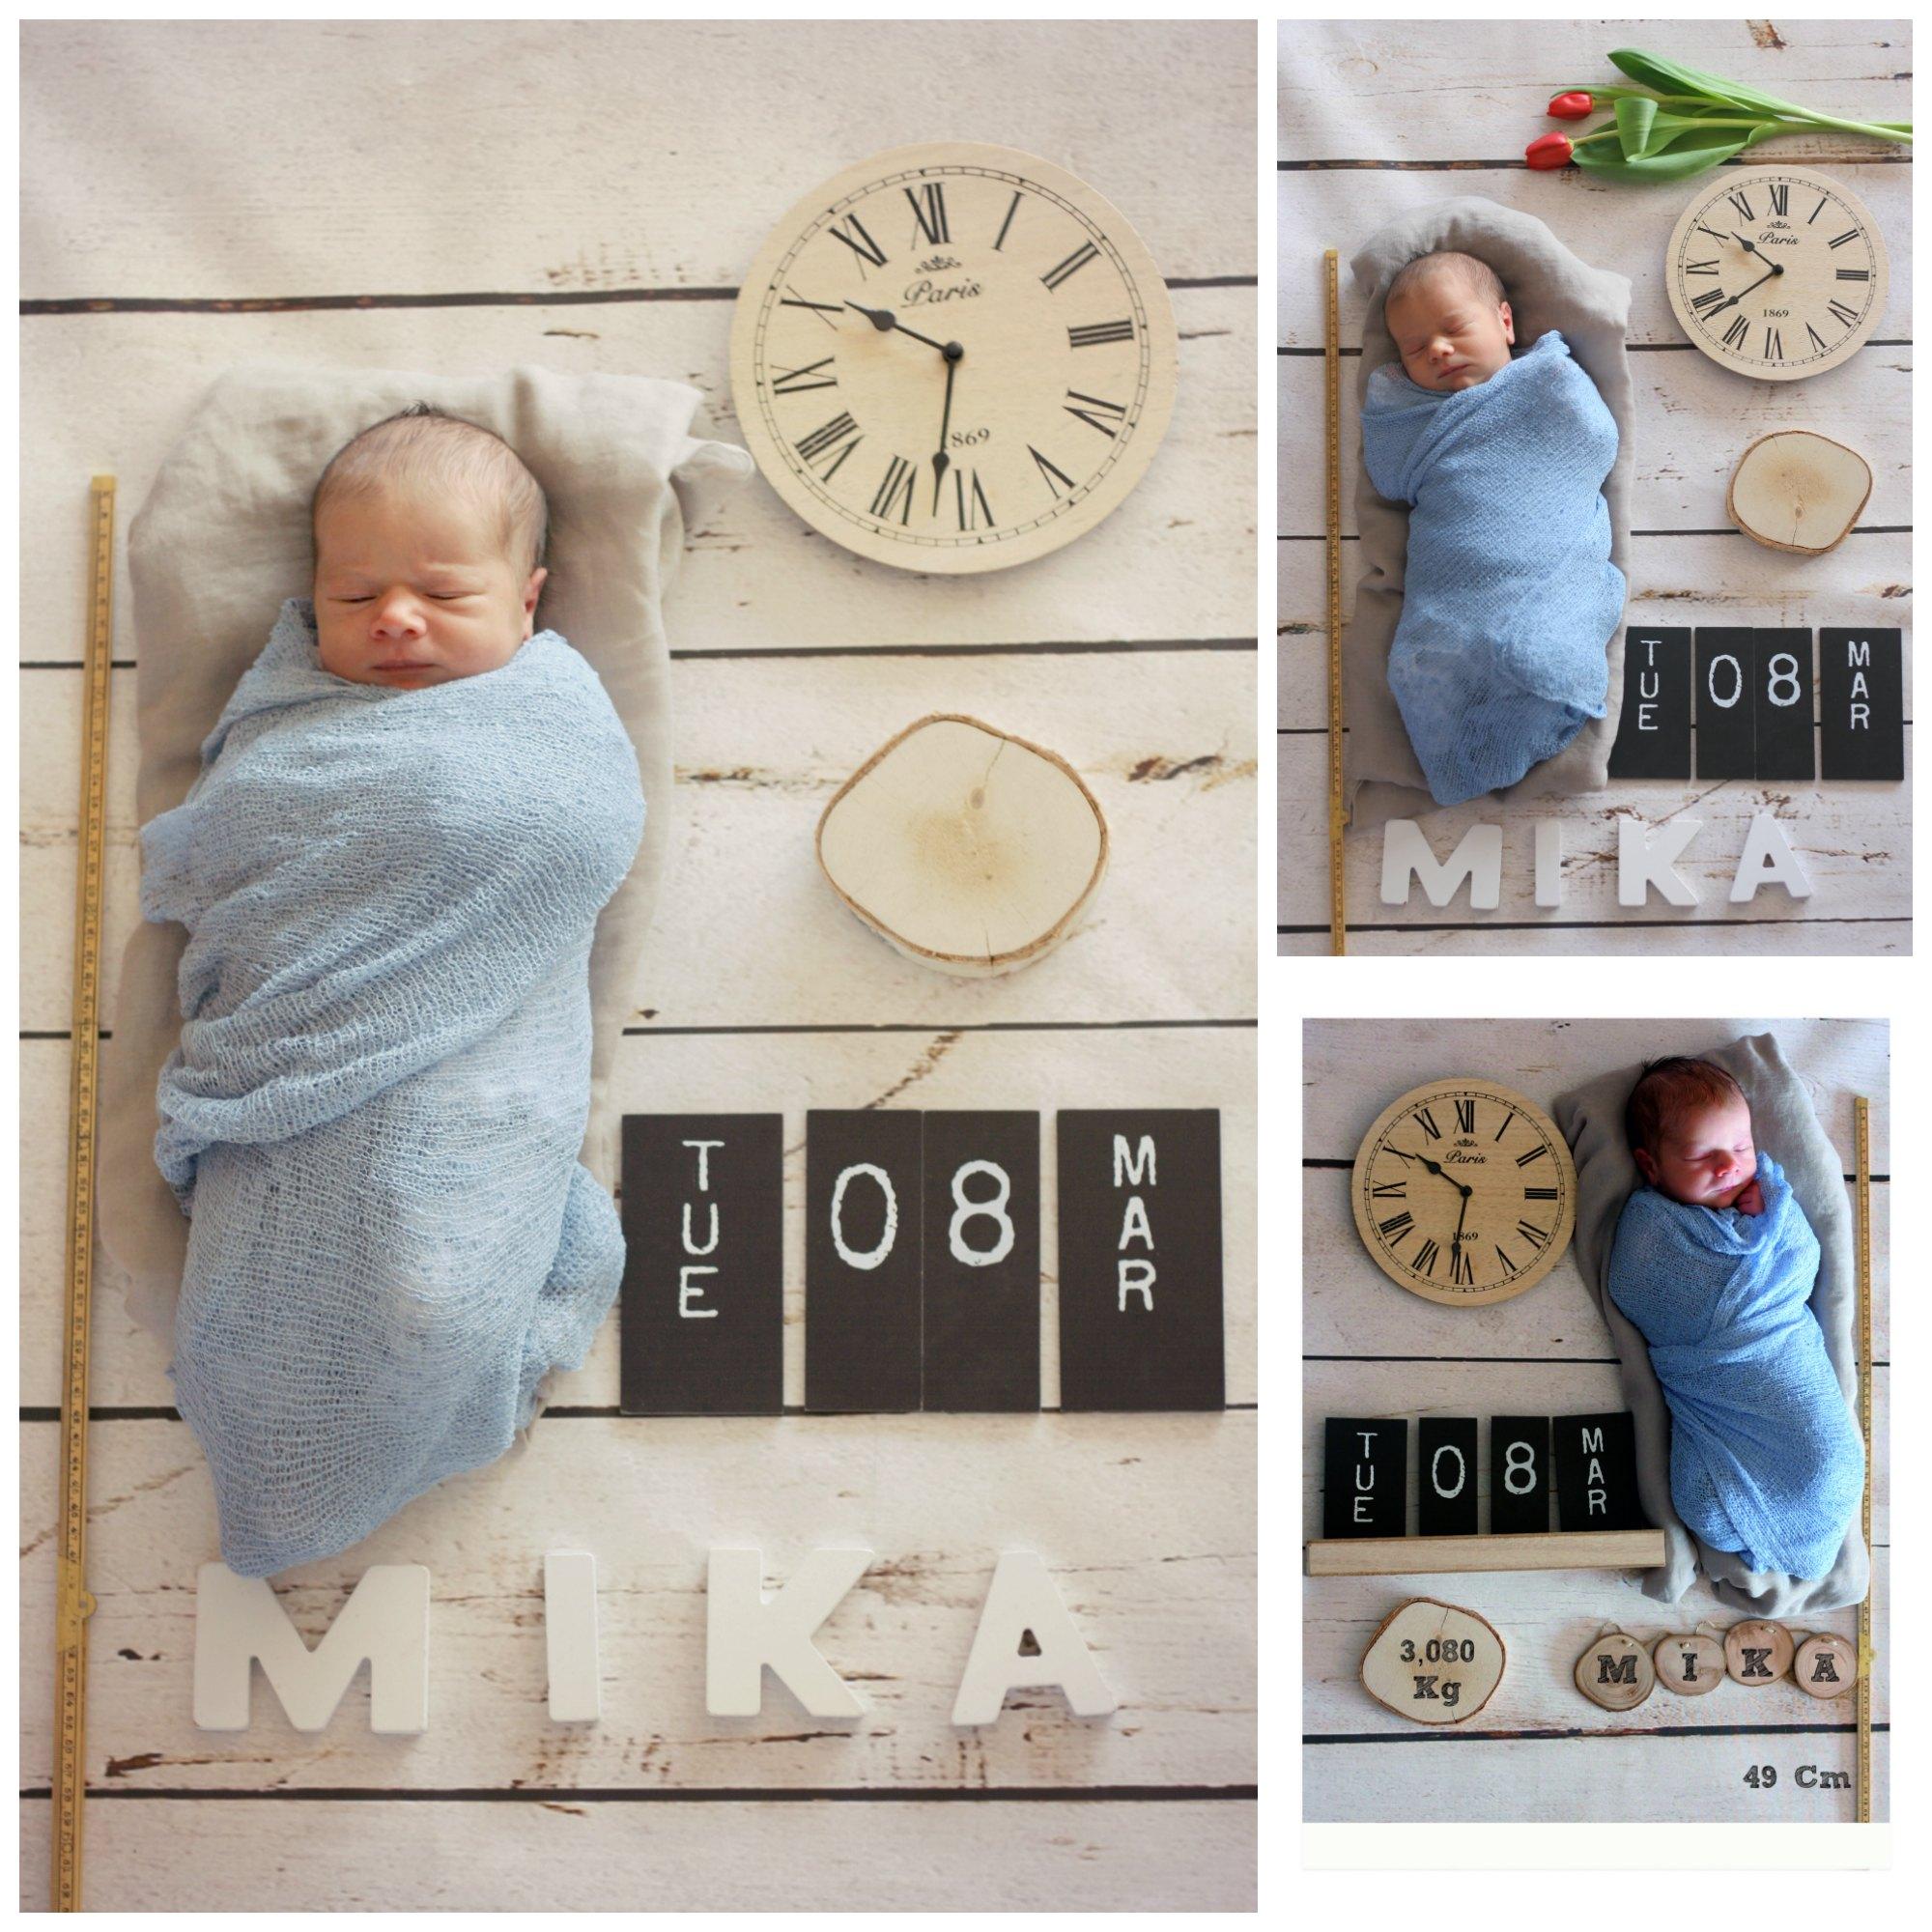 geboortekaart Collage